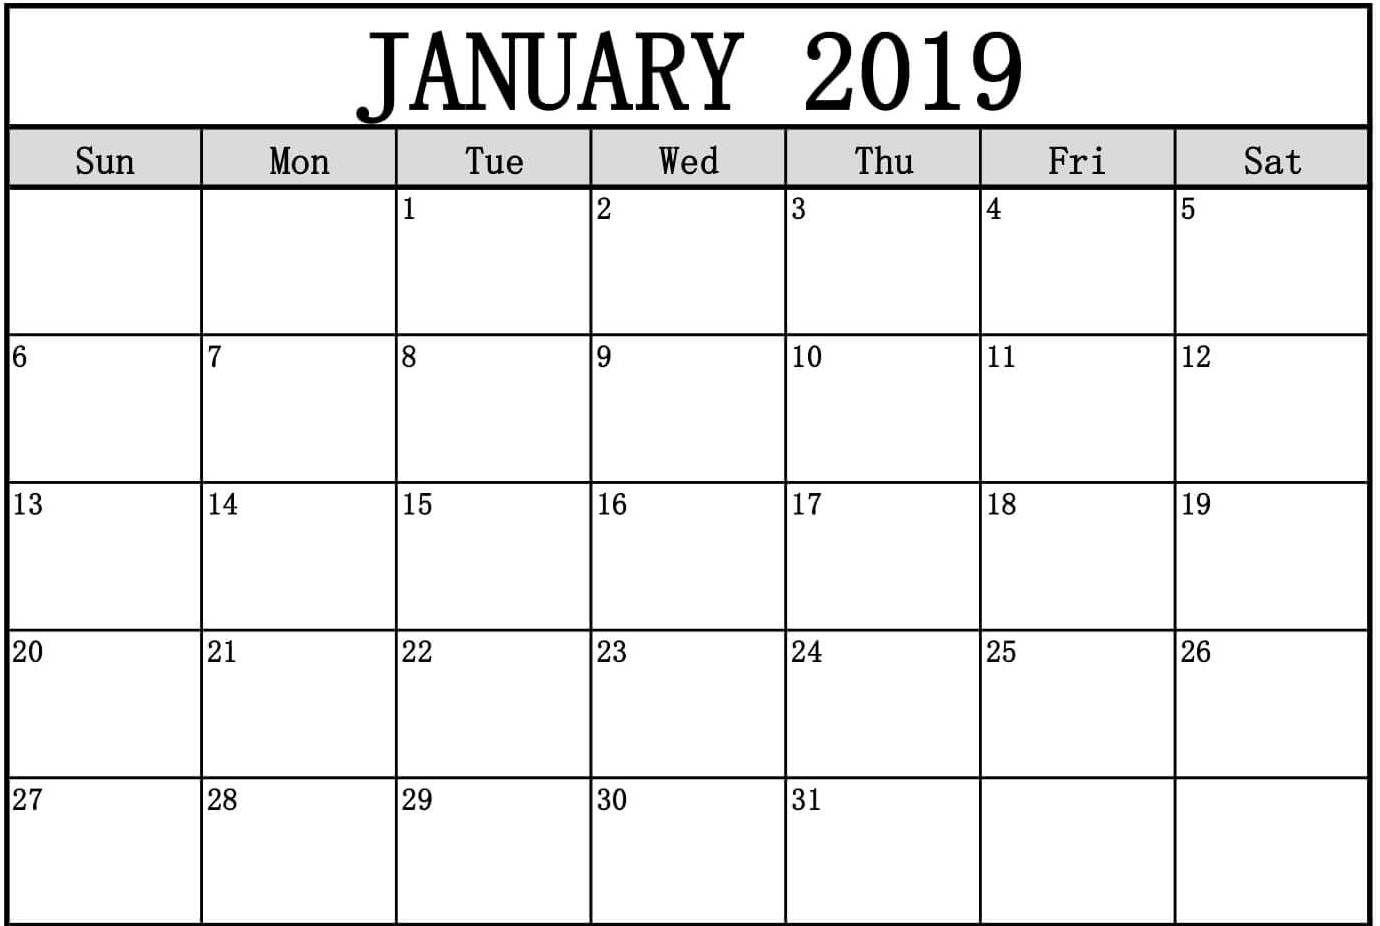 January 2019 Calendar Page To Print #Januarycalendar2019 # With Full Page January Calendar